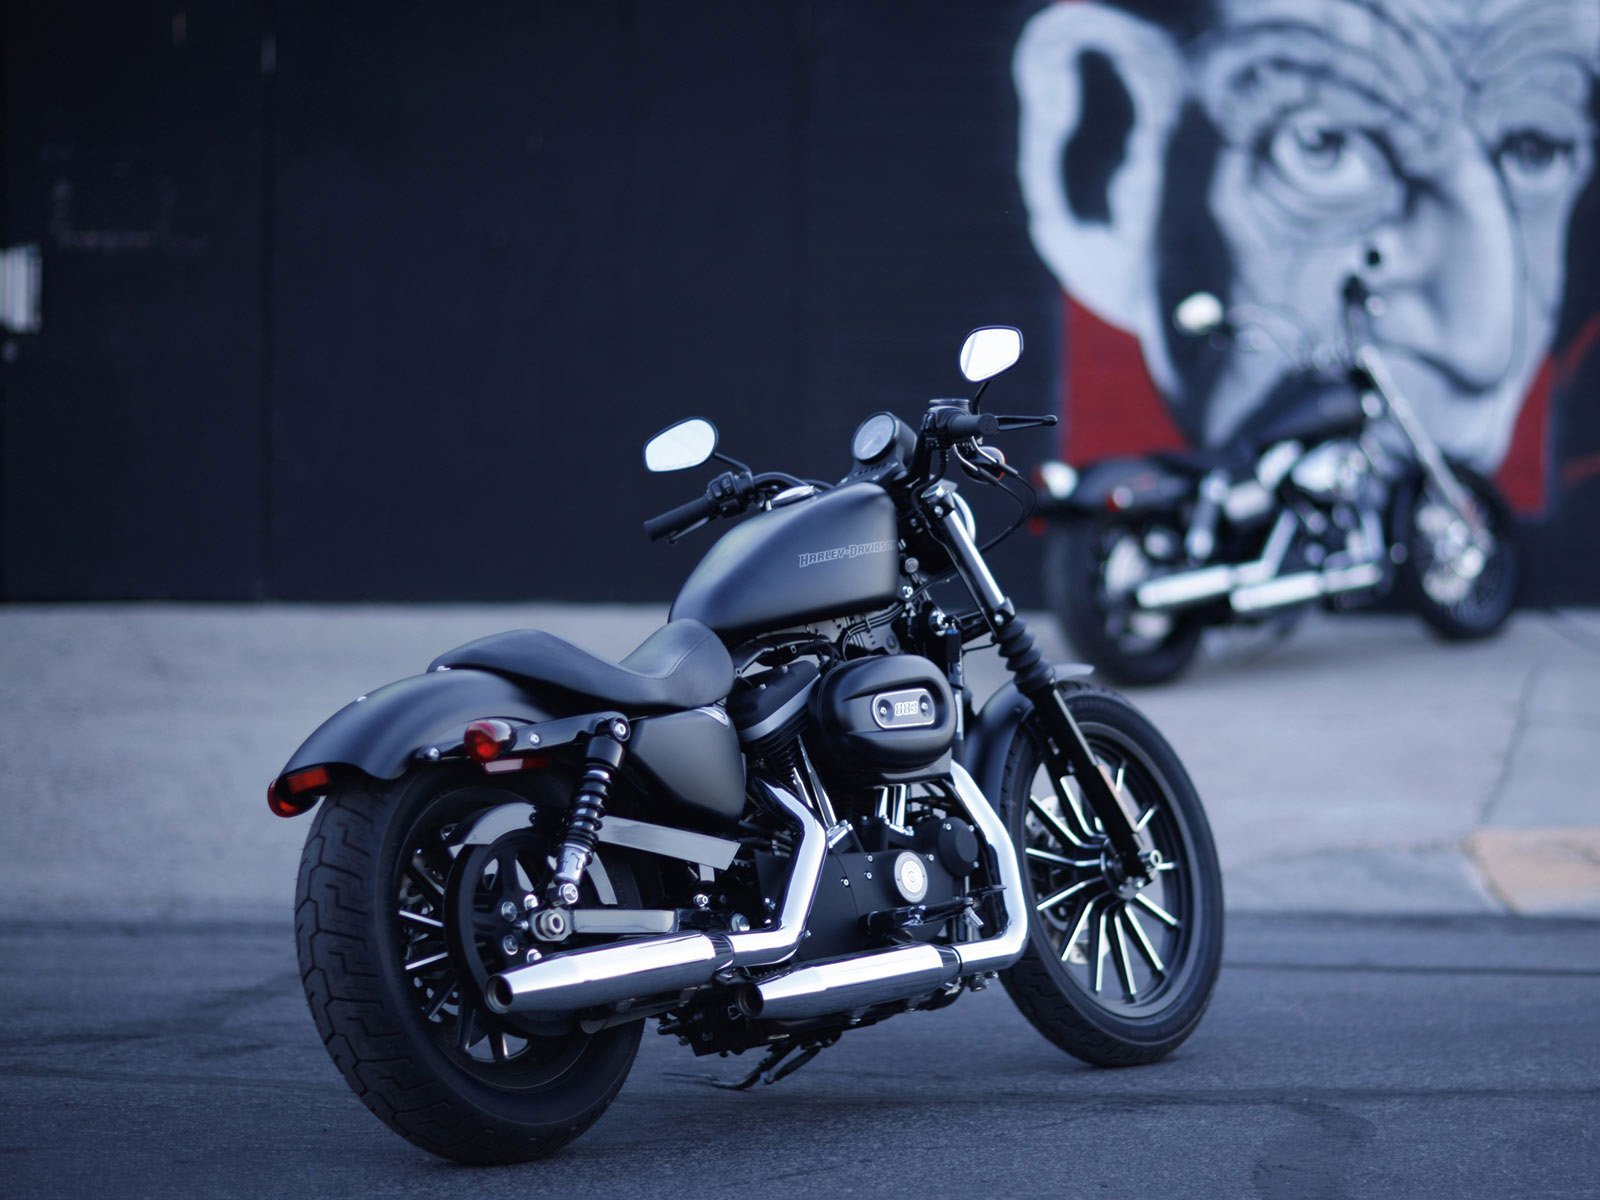 Harley Davidson Logo Motorcycle Wallpaper Wide 10715 Wallpaper High 1600x1200